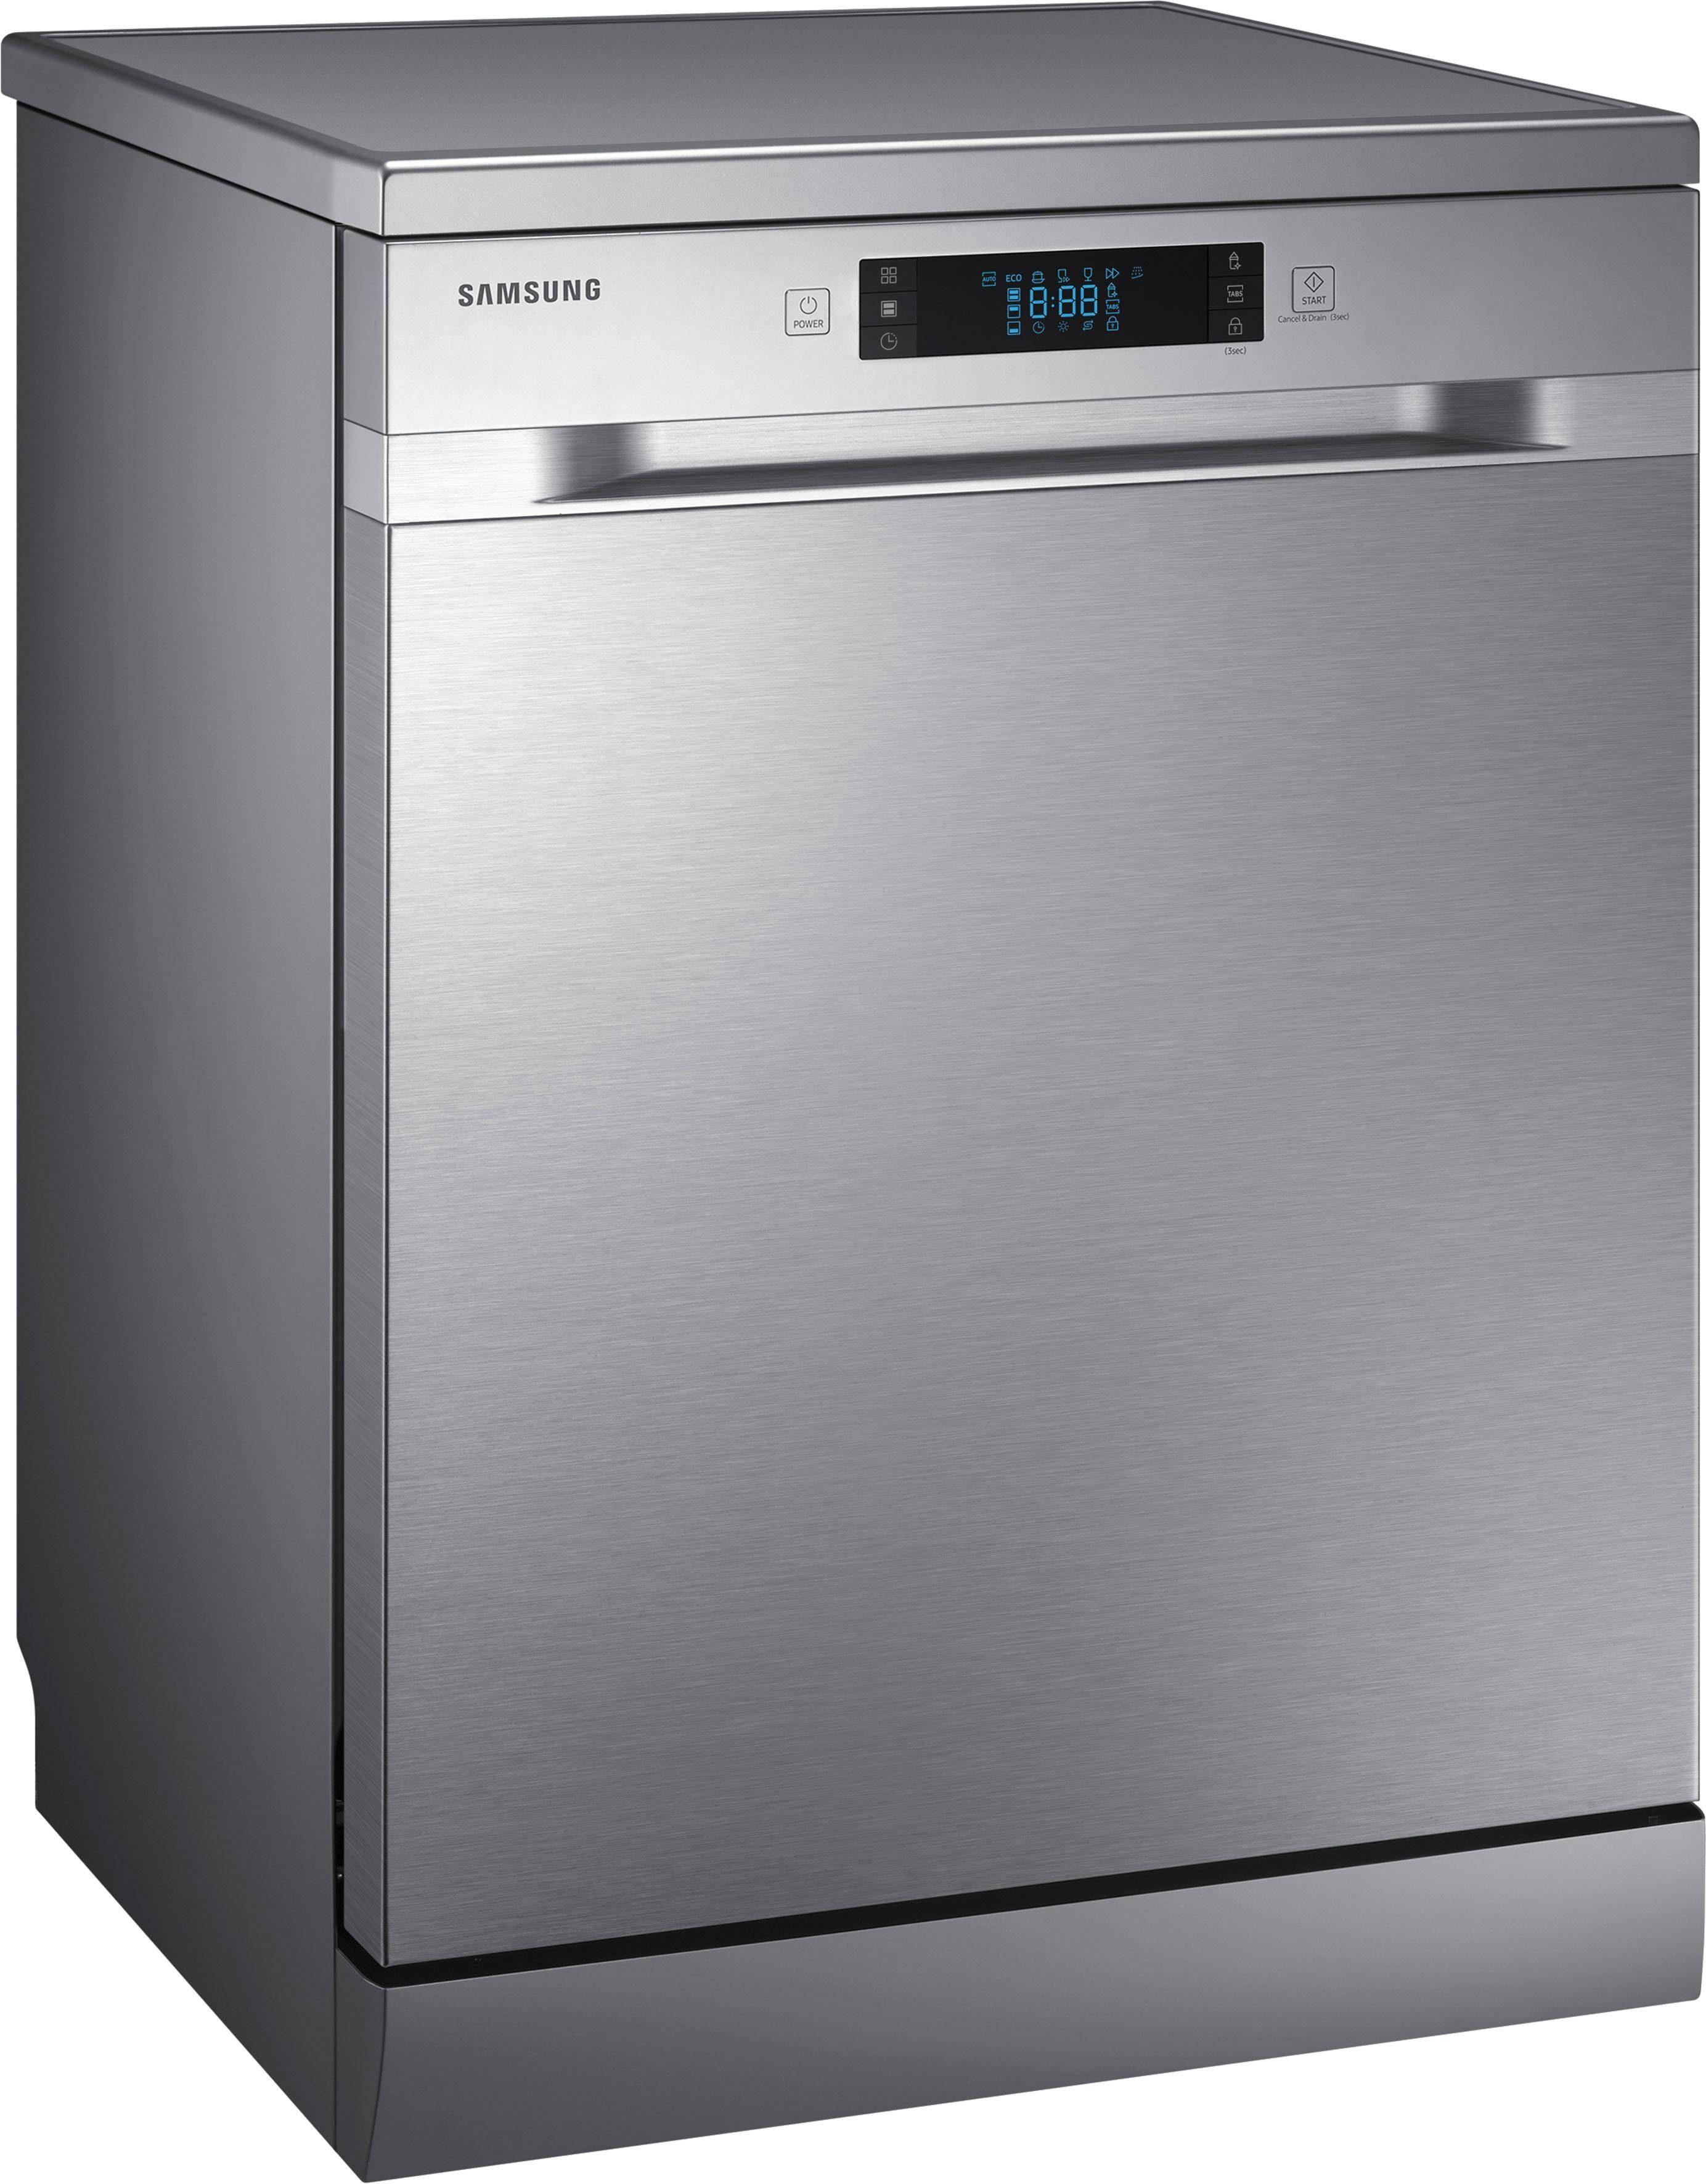 Samsung Standgeschirrspüler DW5500, DW60M6050FS/EC, 10,5 l, 14 Maßgedecke